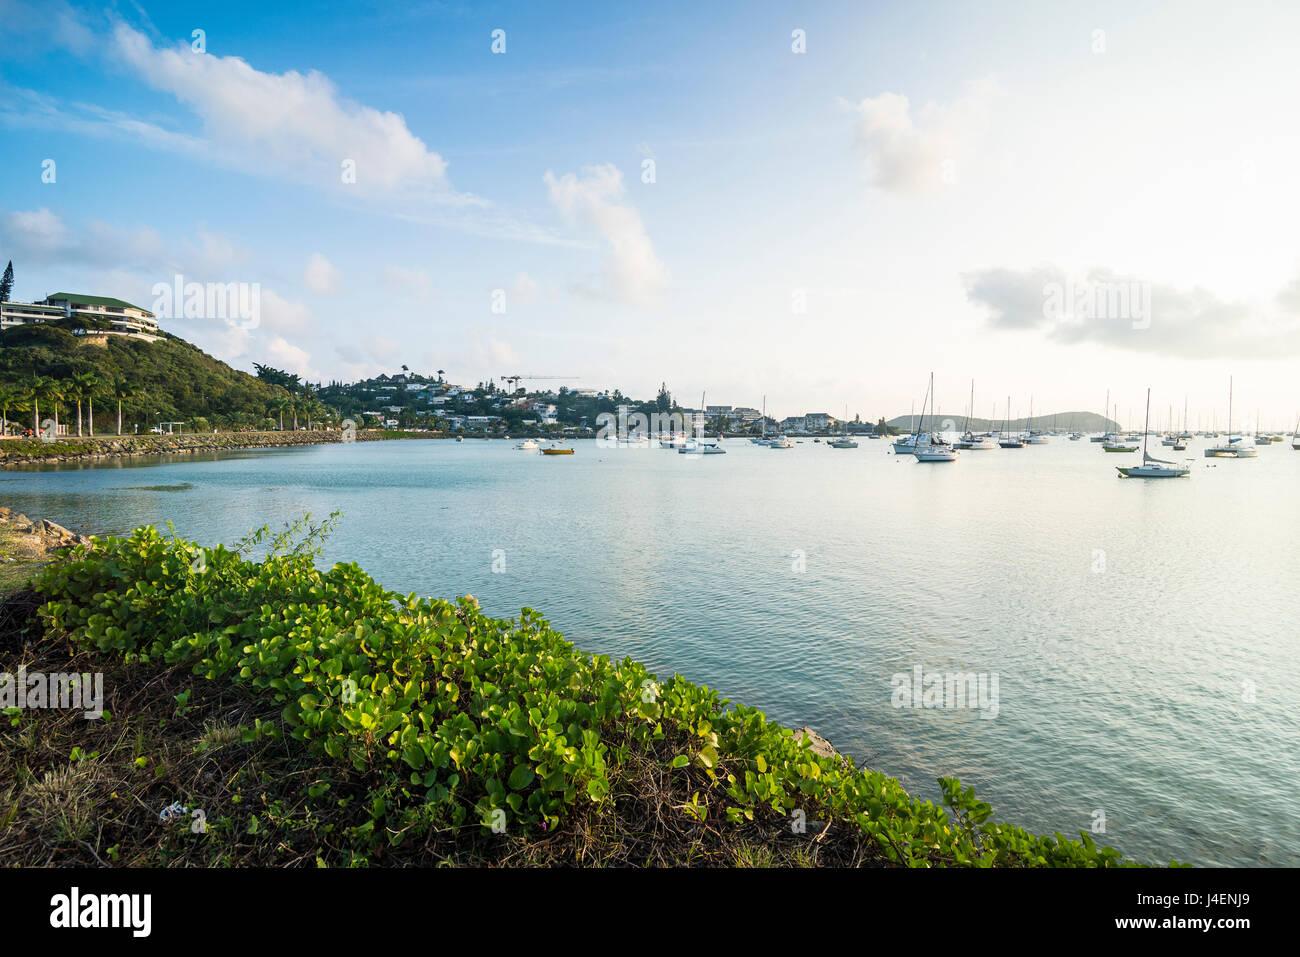 The Magenta Port Sud bay, Noumea, New Caledonia, Pacific - Stock Image